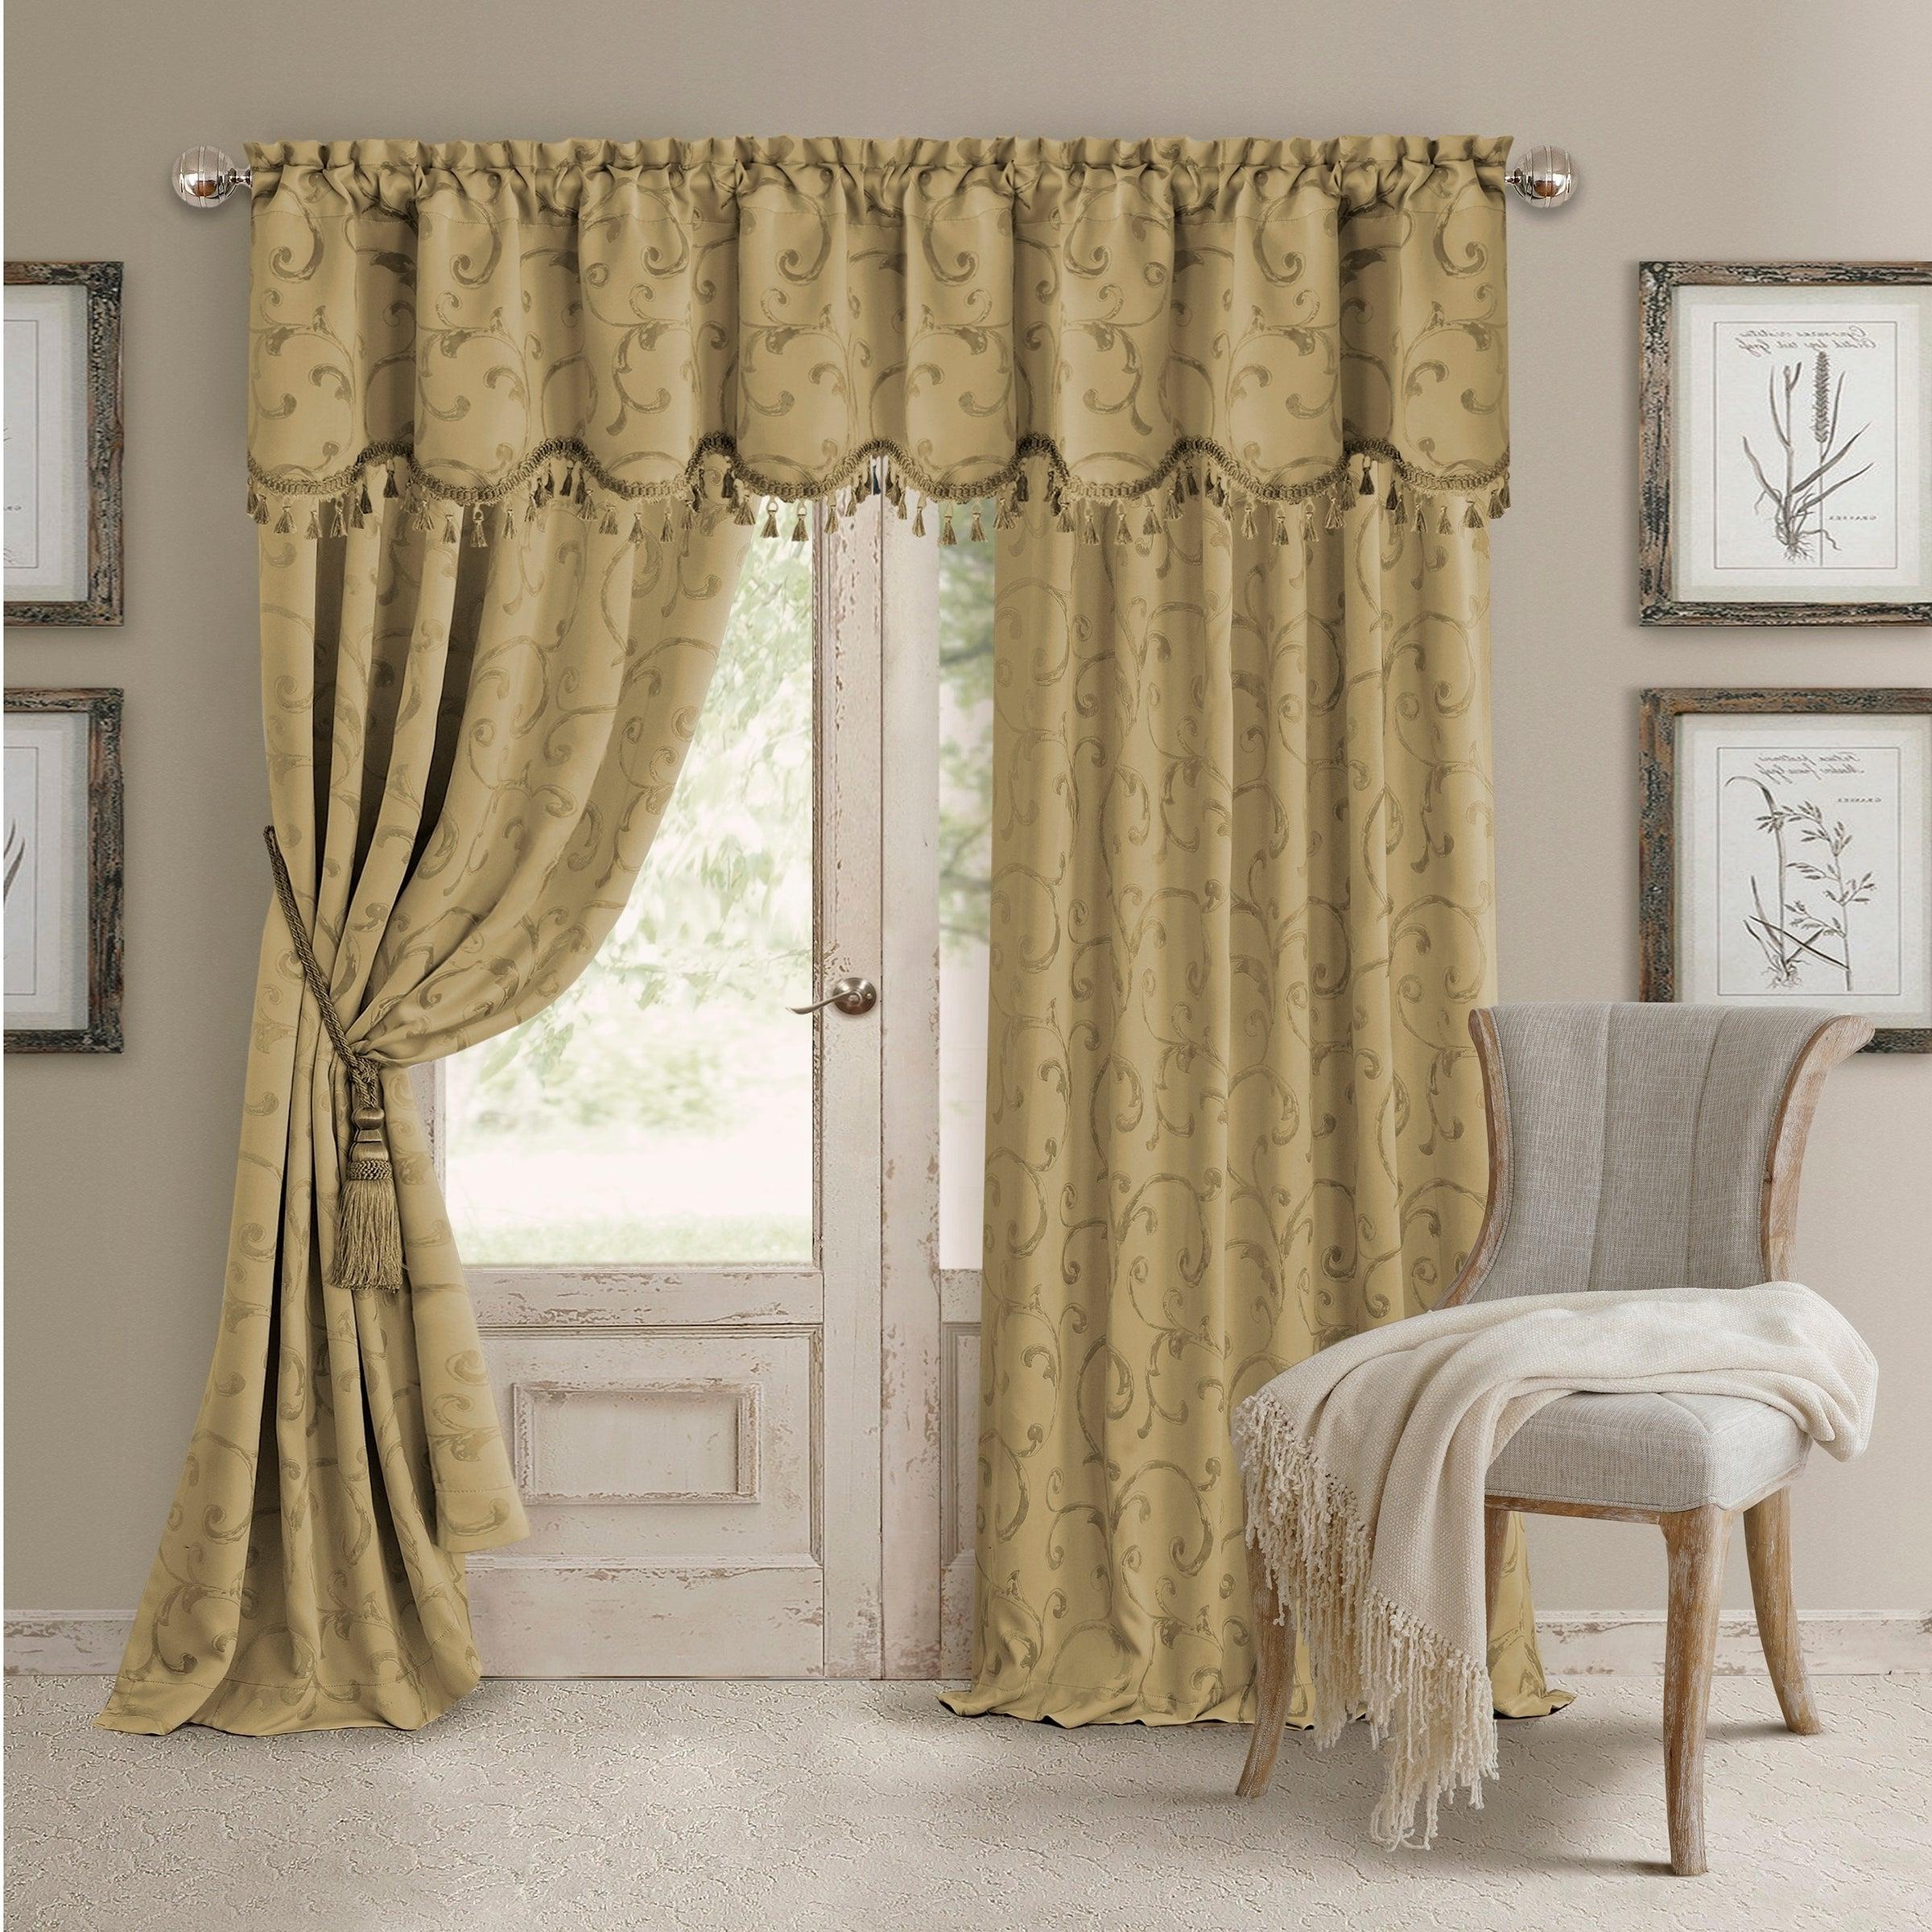 Elrene Mia Jacquard Blackout Curtain Panels Pertaining To Fashionable Elrene Mia Jacquard Blackout Curtain Panel (View 3 of 20)